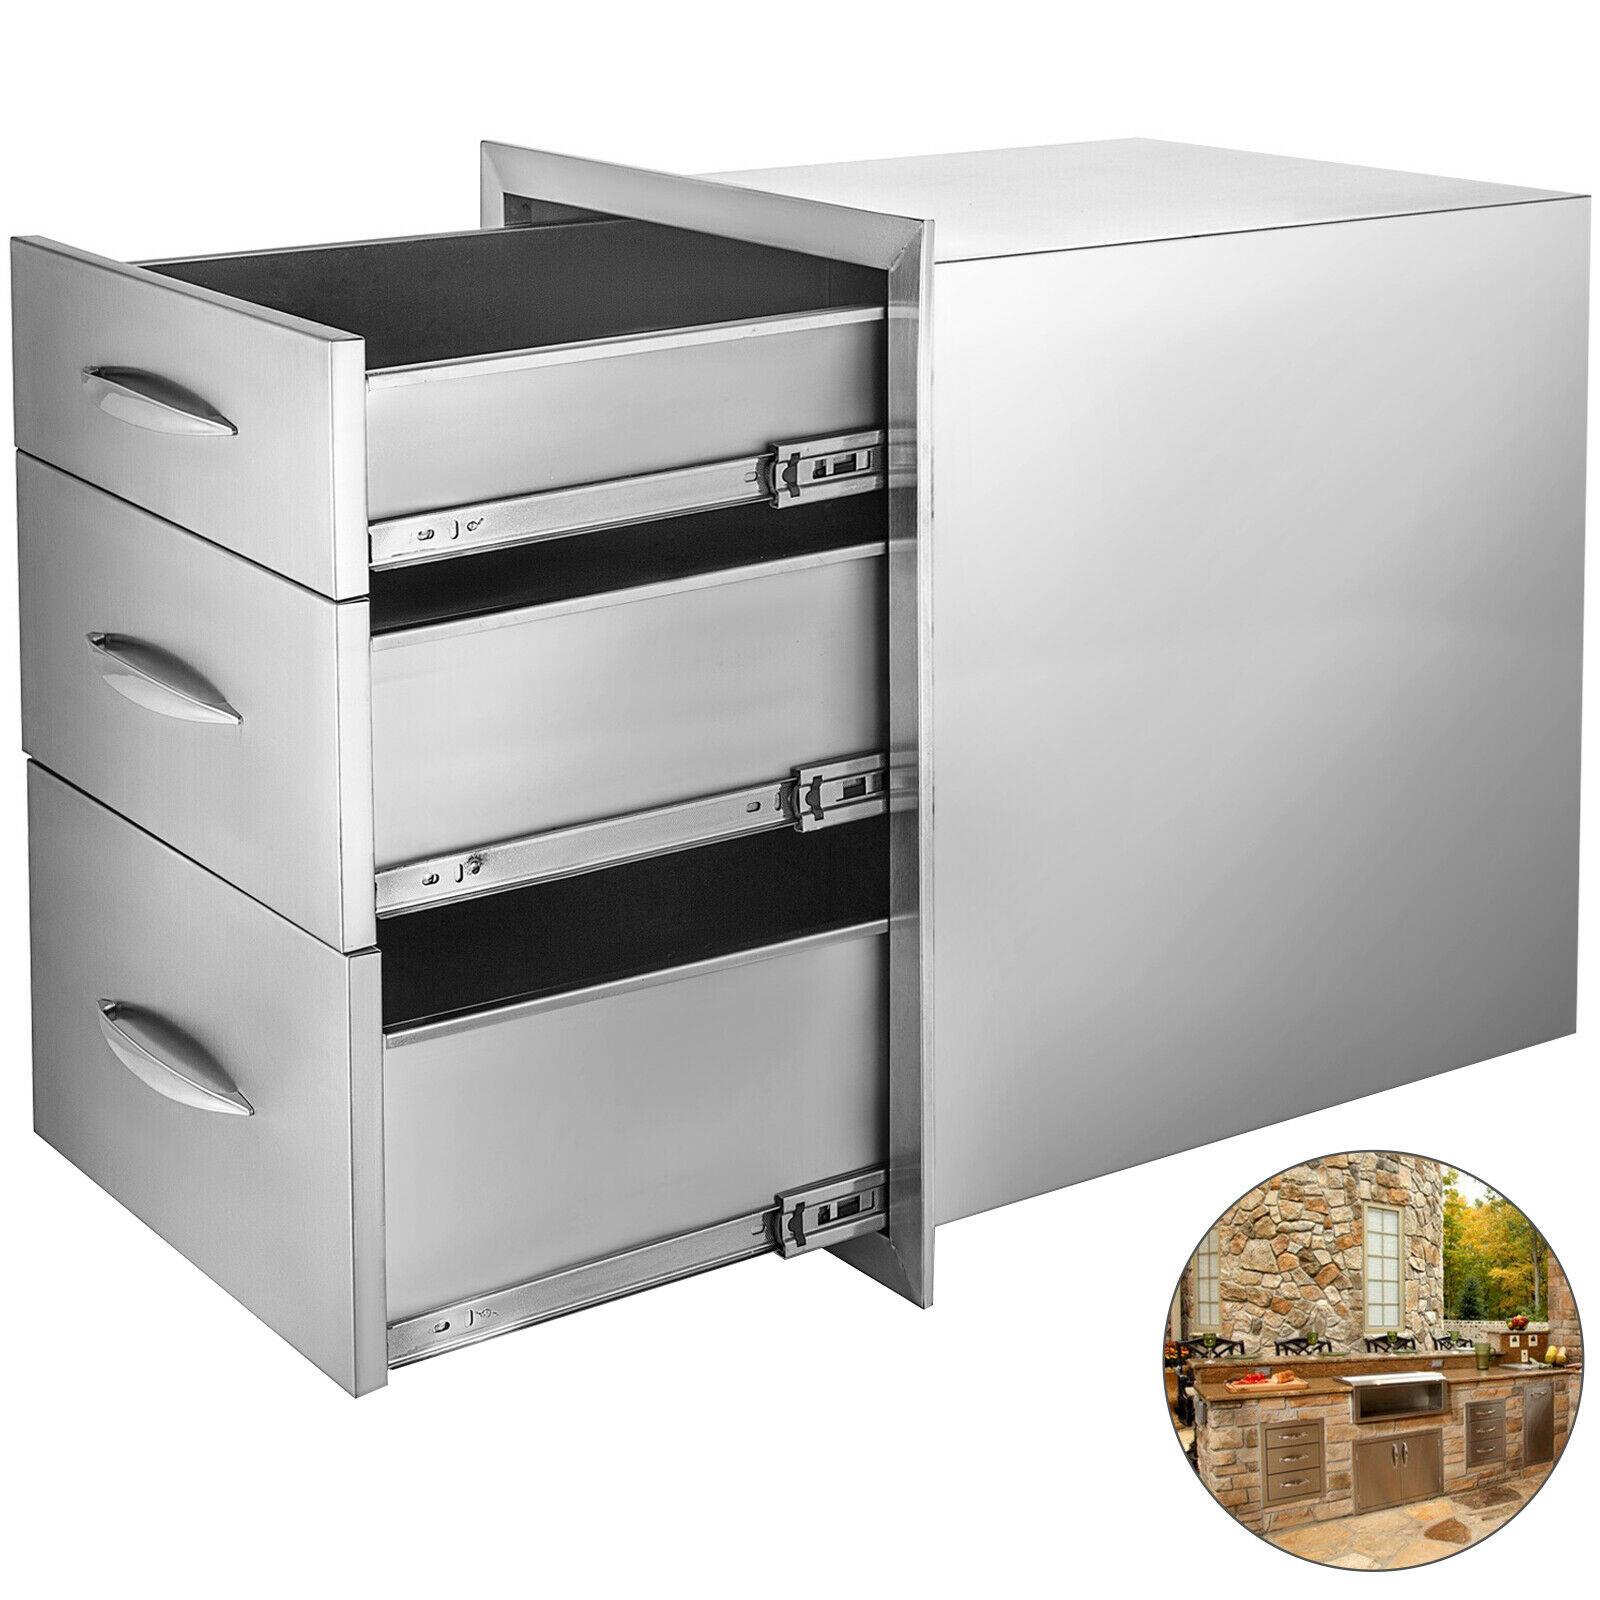 Cajón de cocina para exteriores de 14x20,25 pulgadas de acero inoxidable de Triple acceso con mango cromado, 14x20,25x23,2 pulgadas